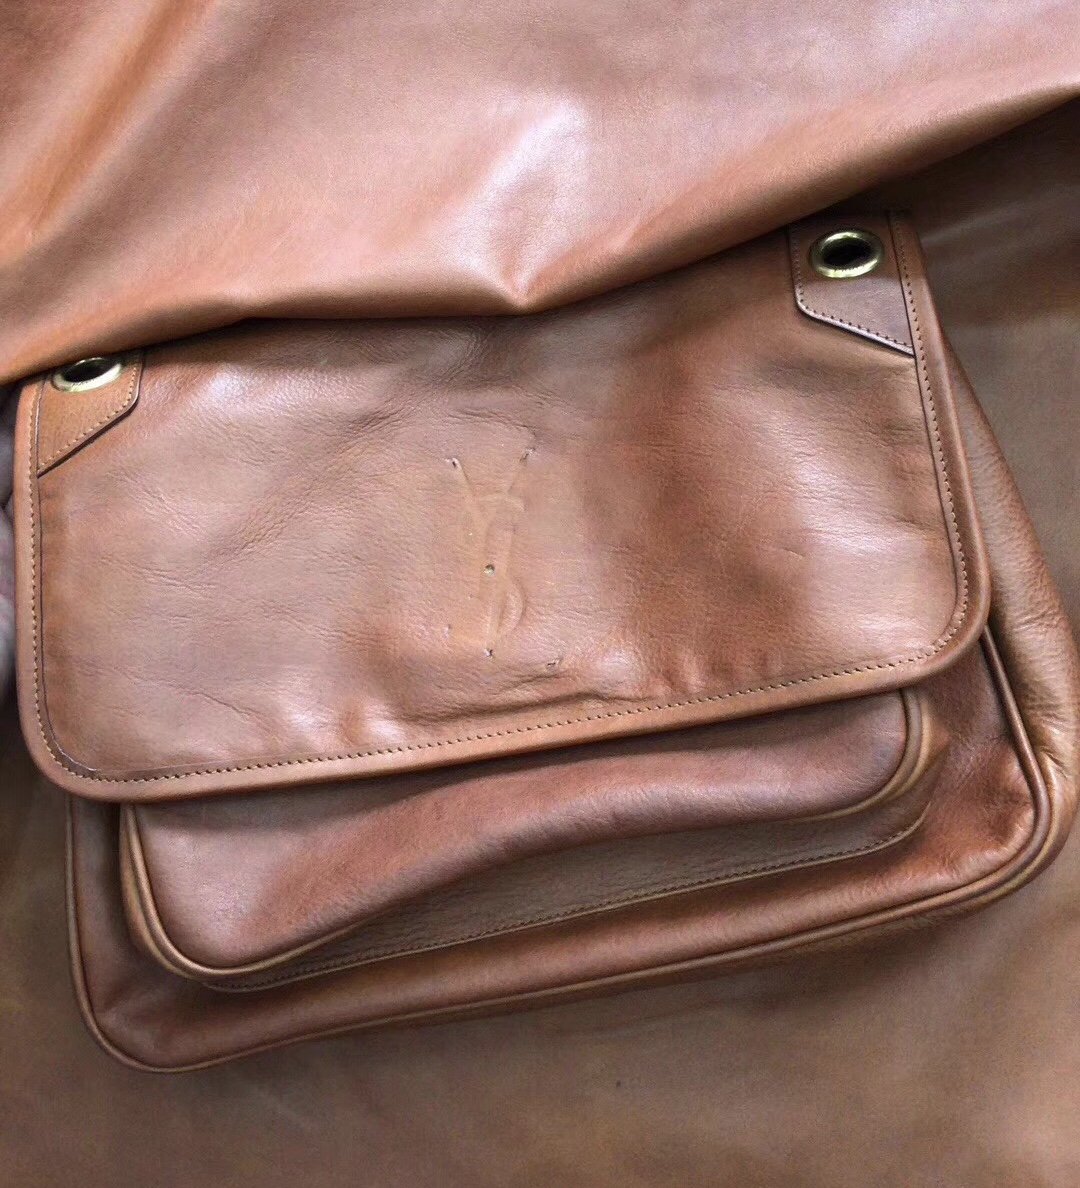 YSL Niki bags中號復古褶皺和絎縫幹邑色 COGNAC真皮 鏈條包 4989130